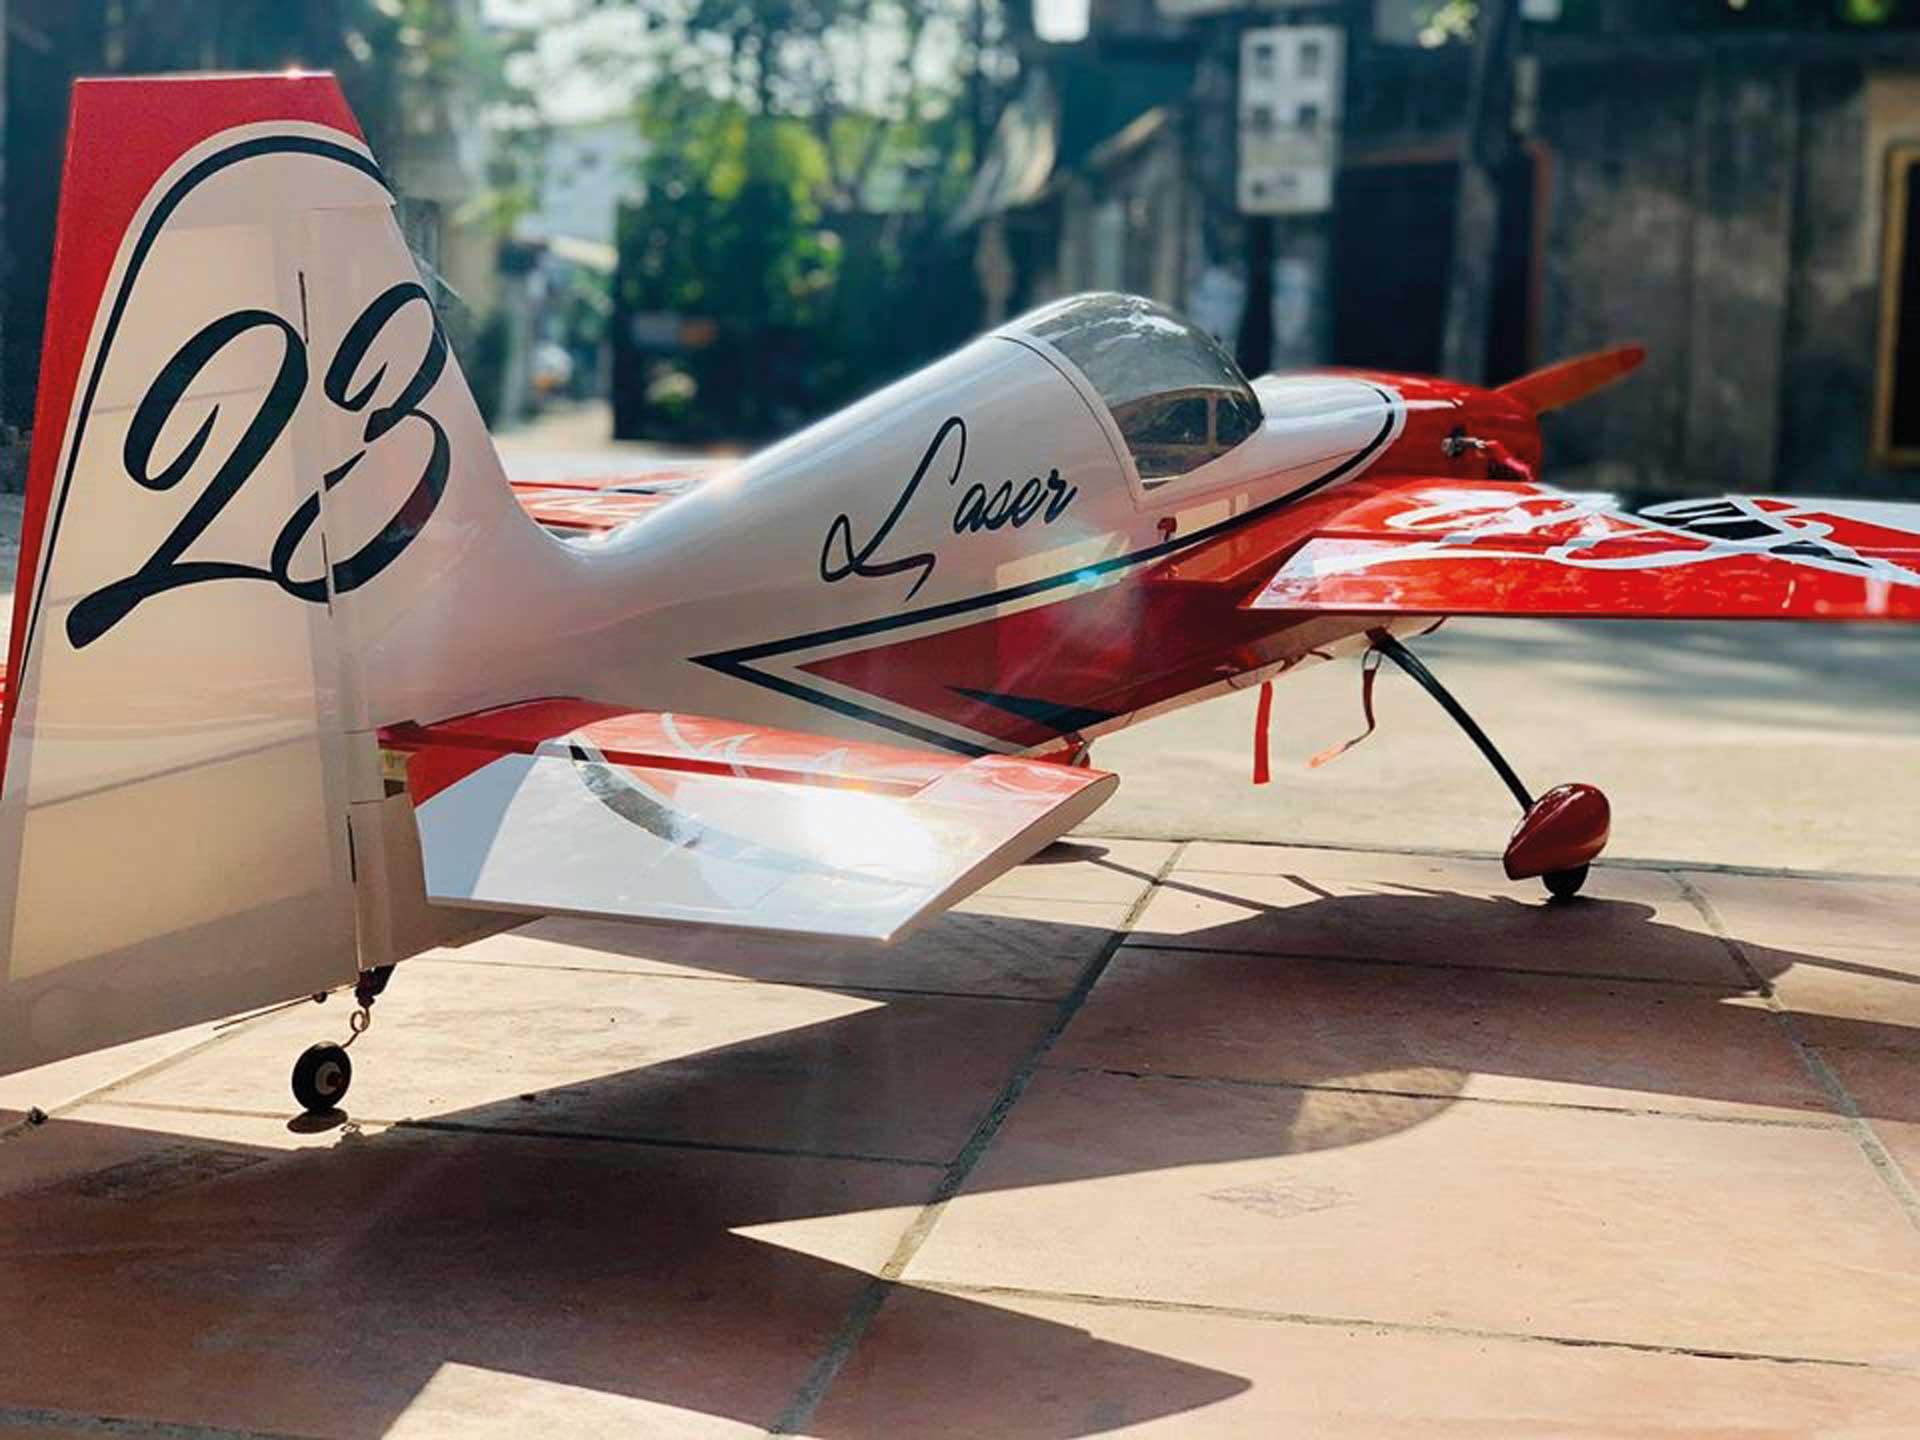 "PILOT-RC LASER 67"" ARF RED/WHITE/BLACK #01"